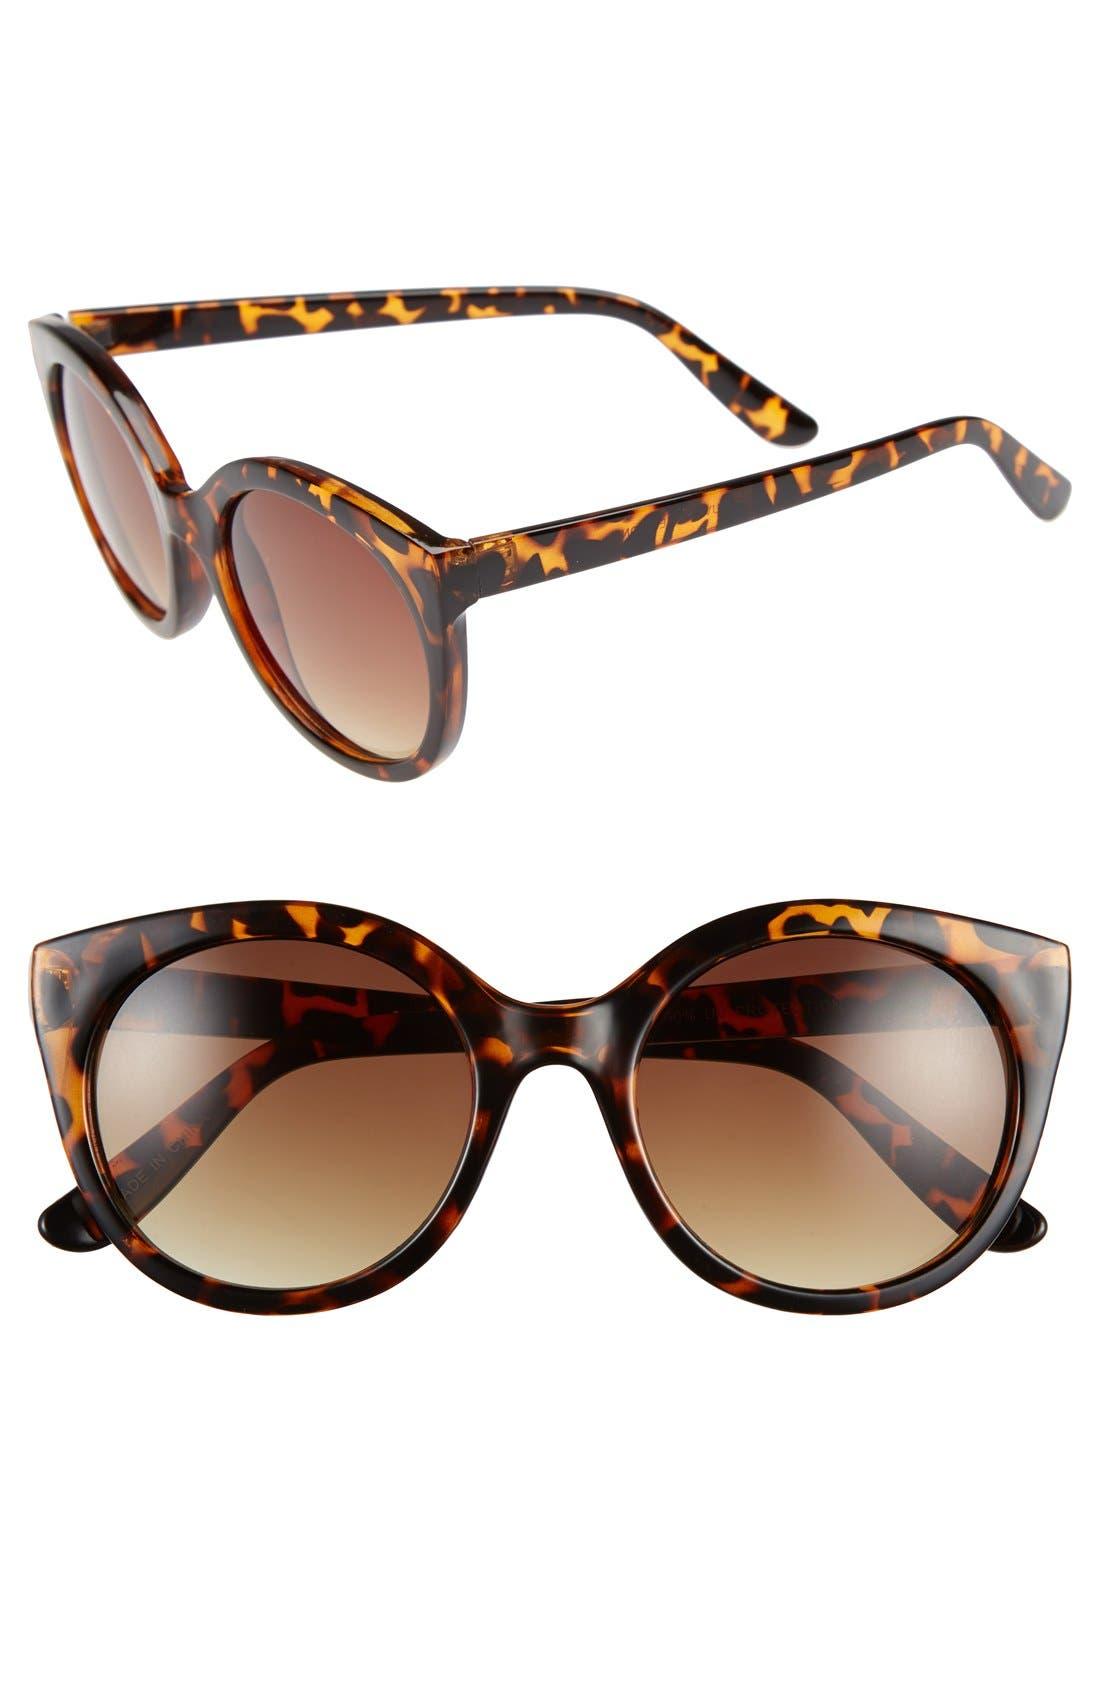 Main Image - BP. 60mm Retro Sunglasses